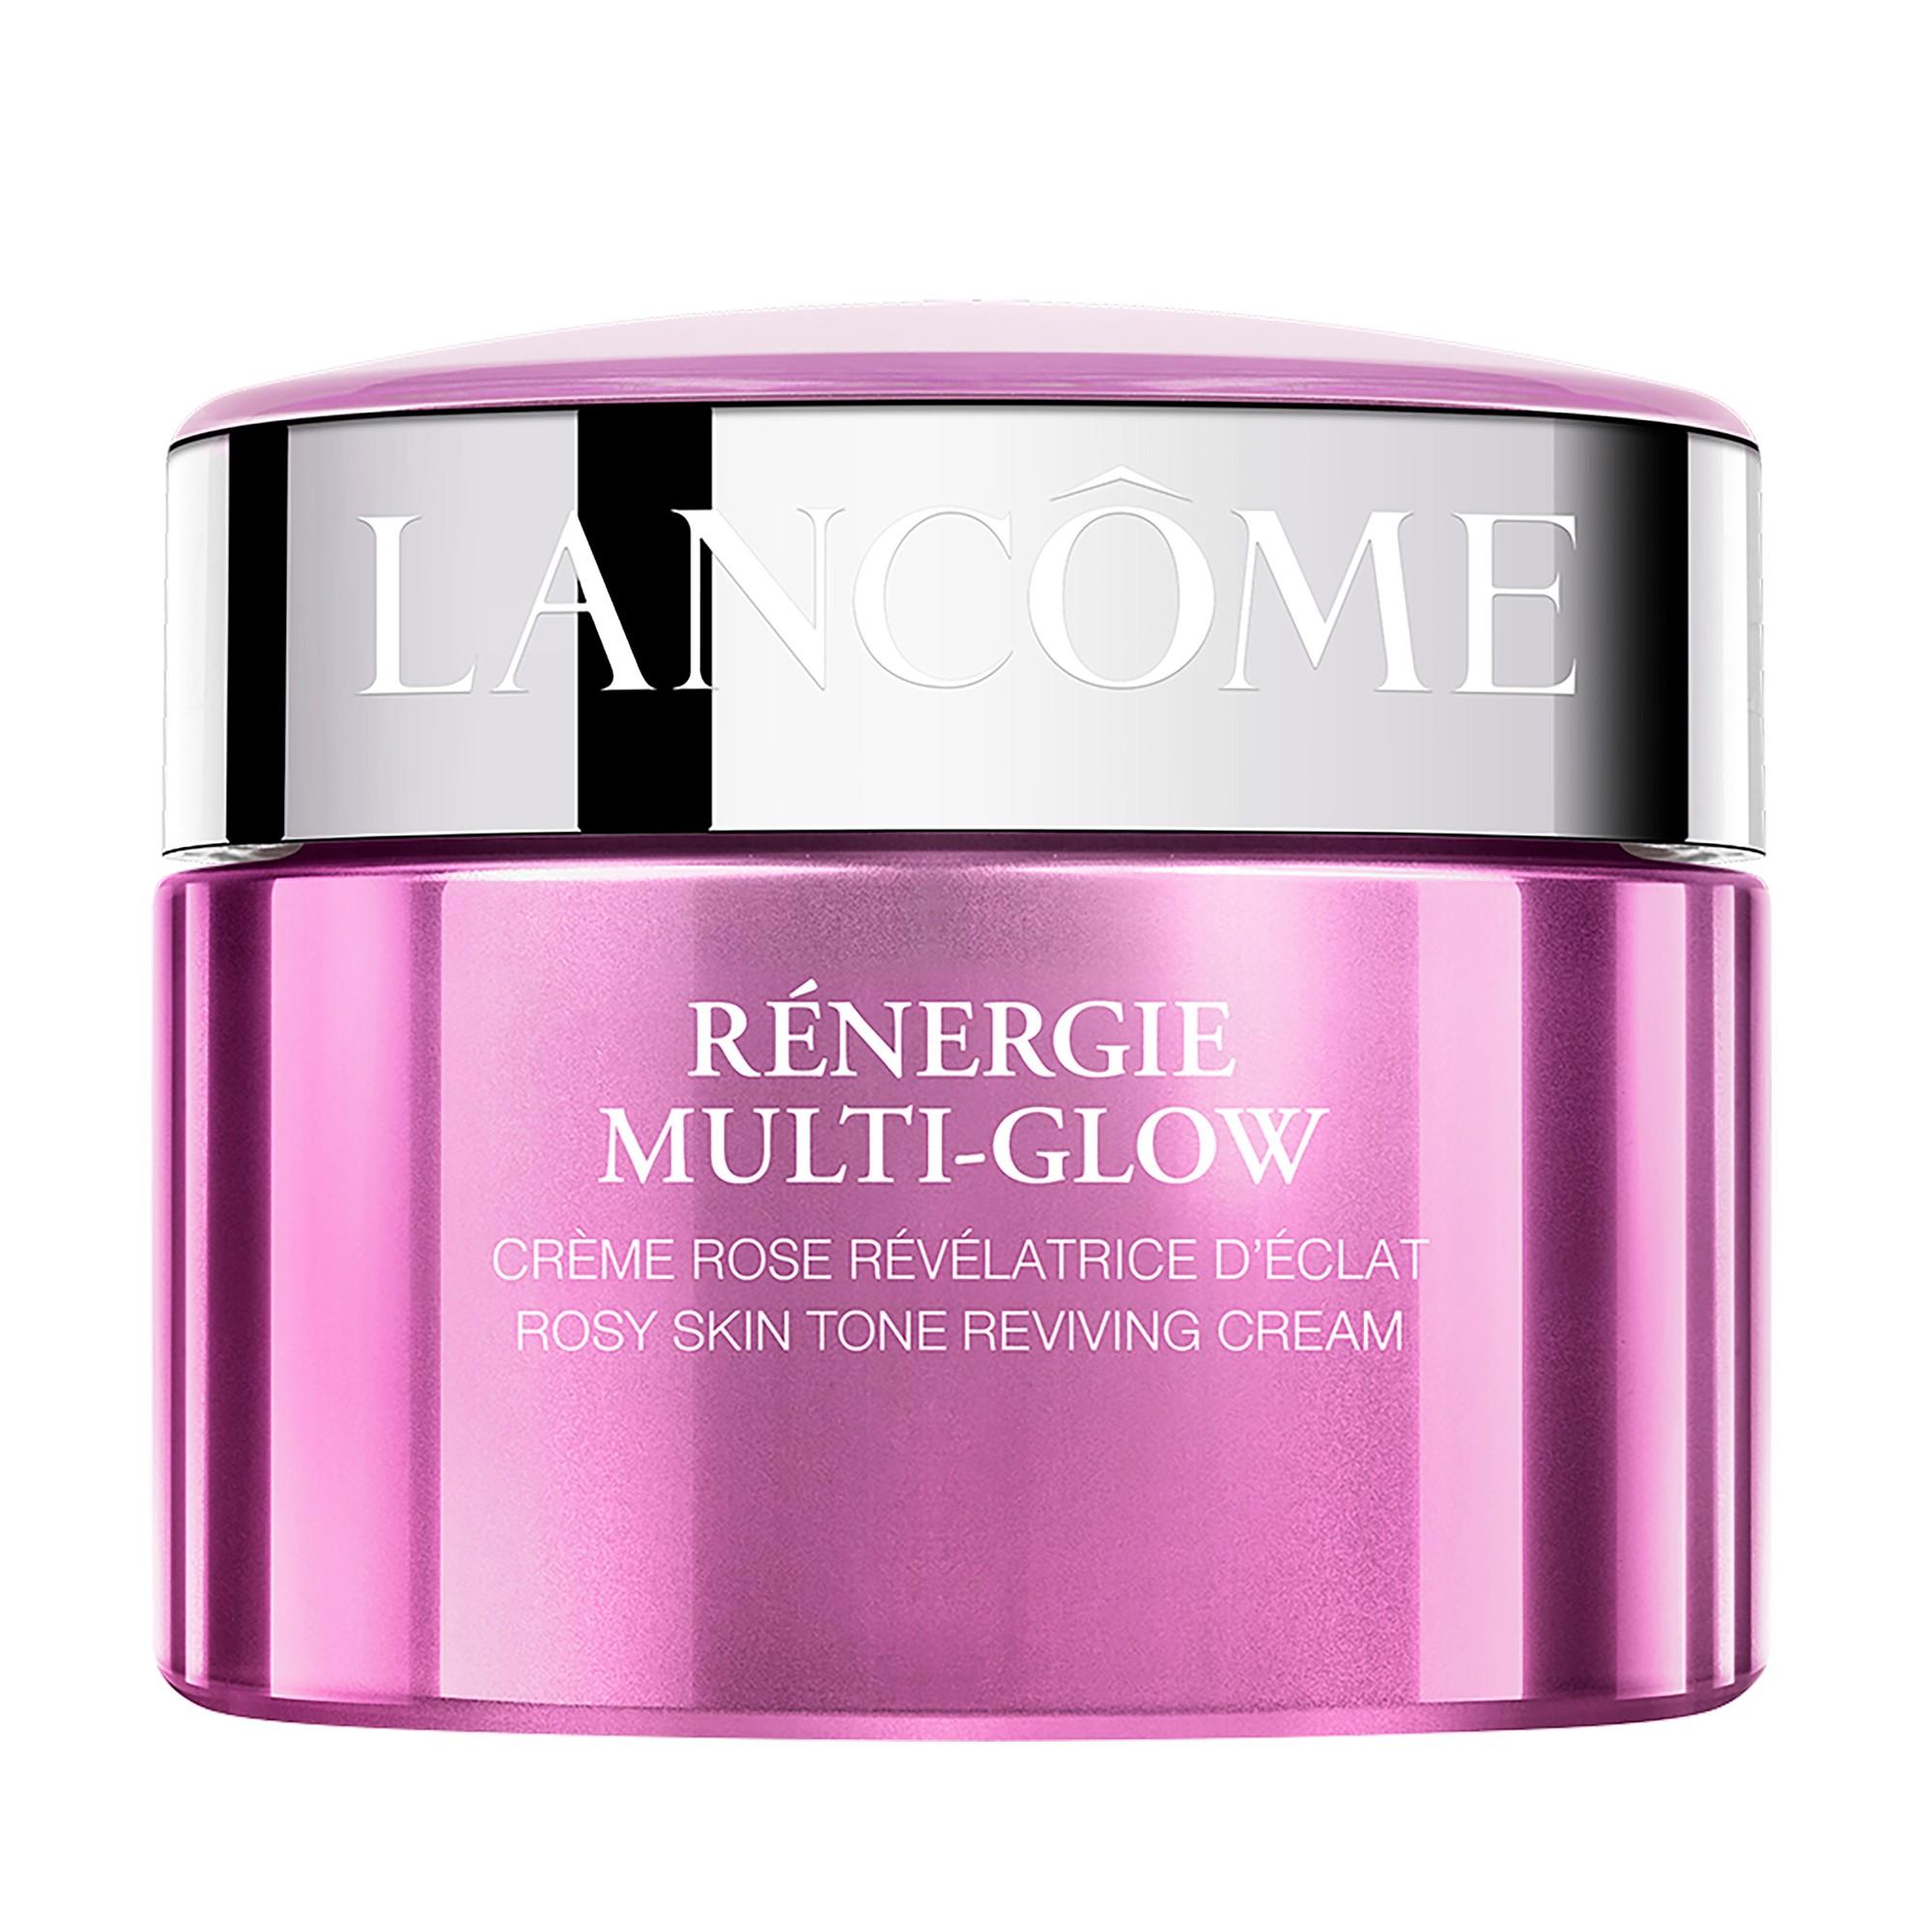 Renergie Multi Glow Day Cream